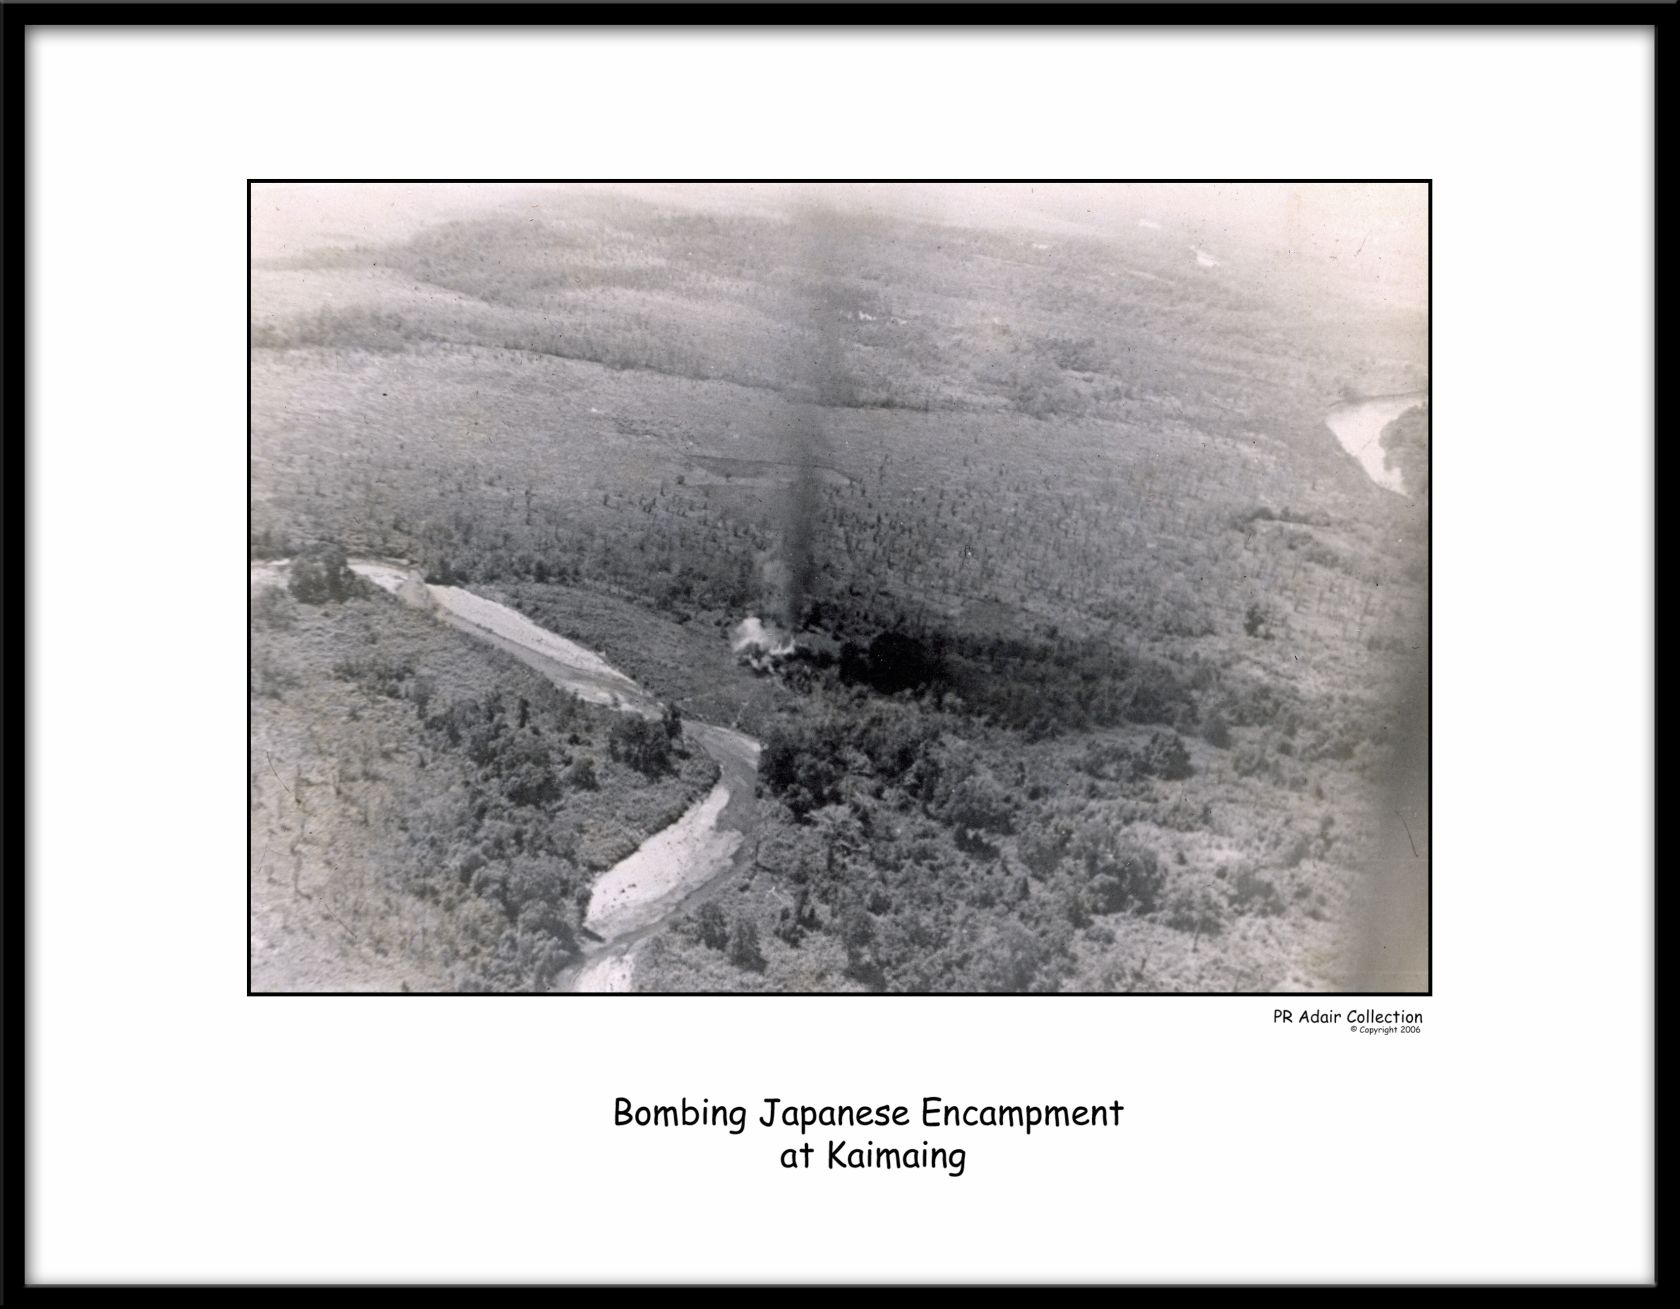 Burma Banshee 127